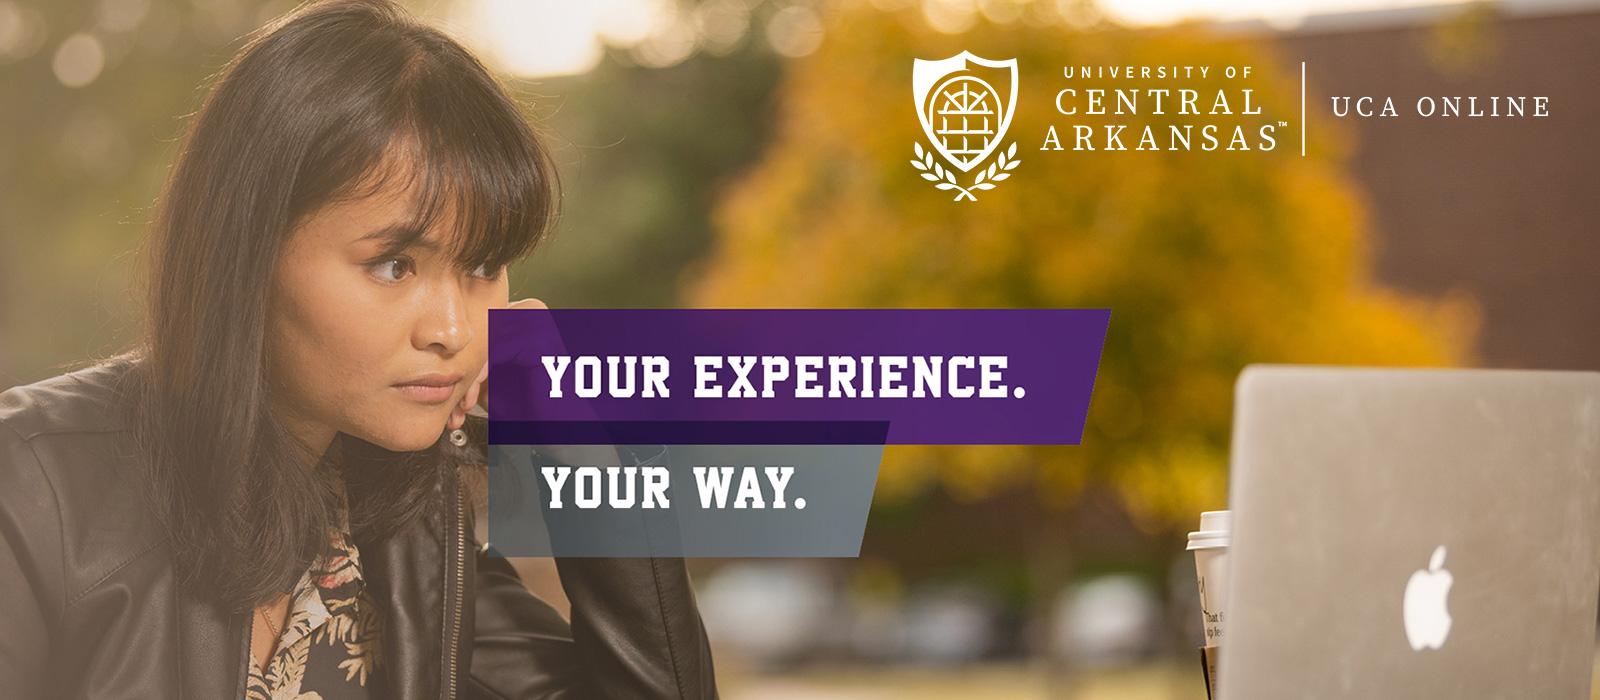 UCA Online: Your Experience. Your Way.